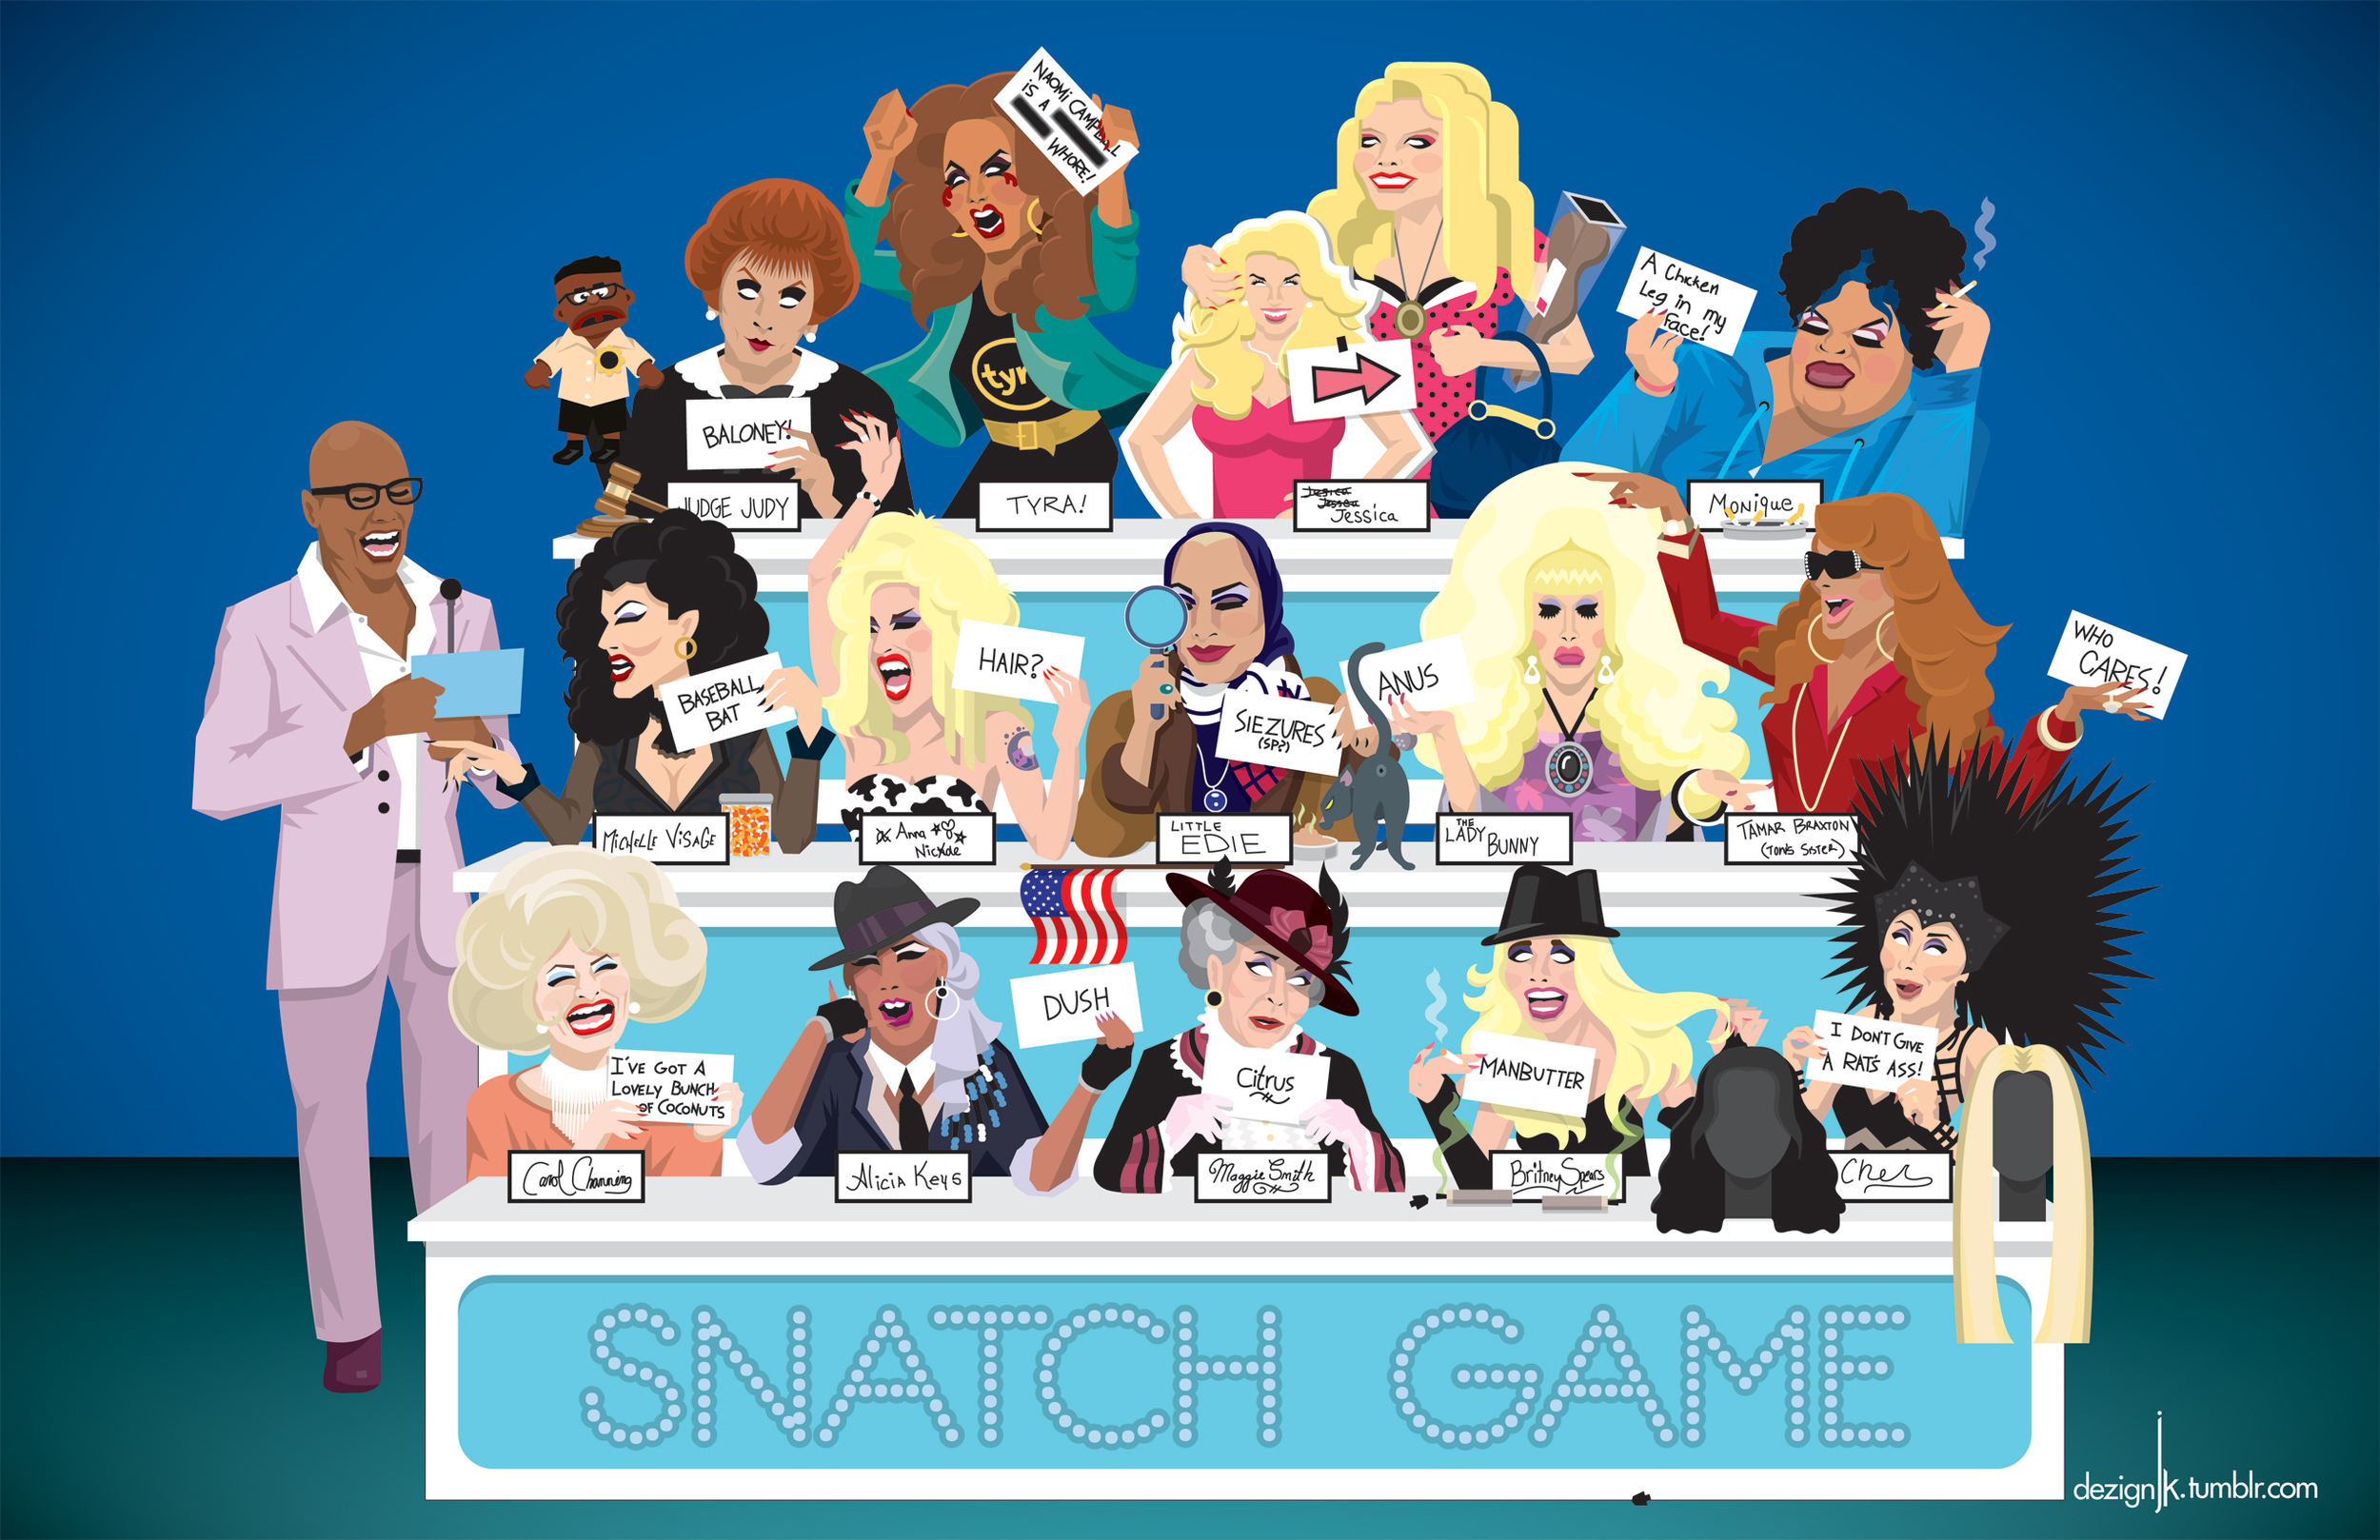 Snatch_game_poster_web.jpg